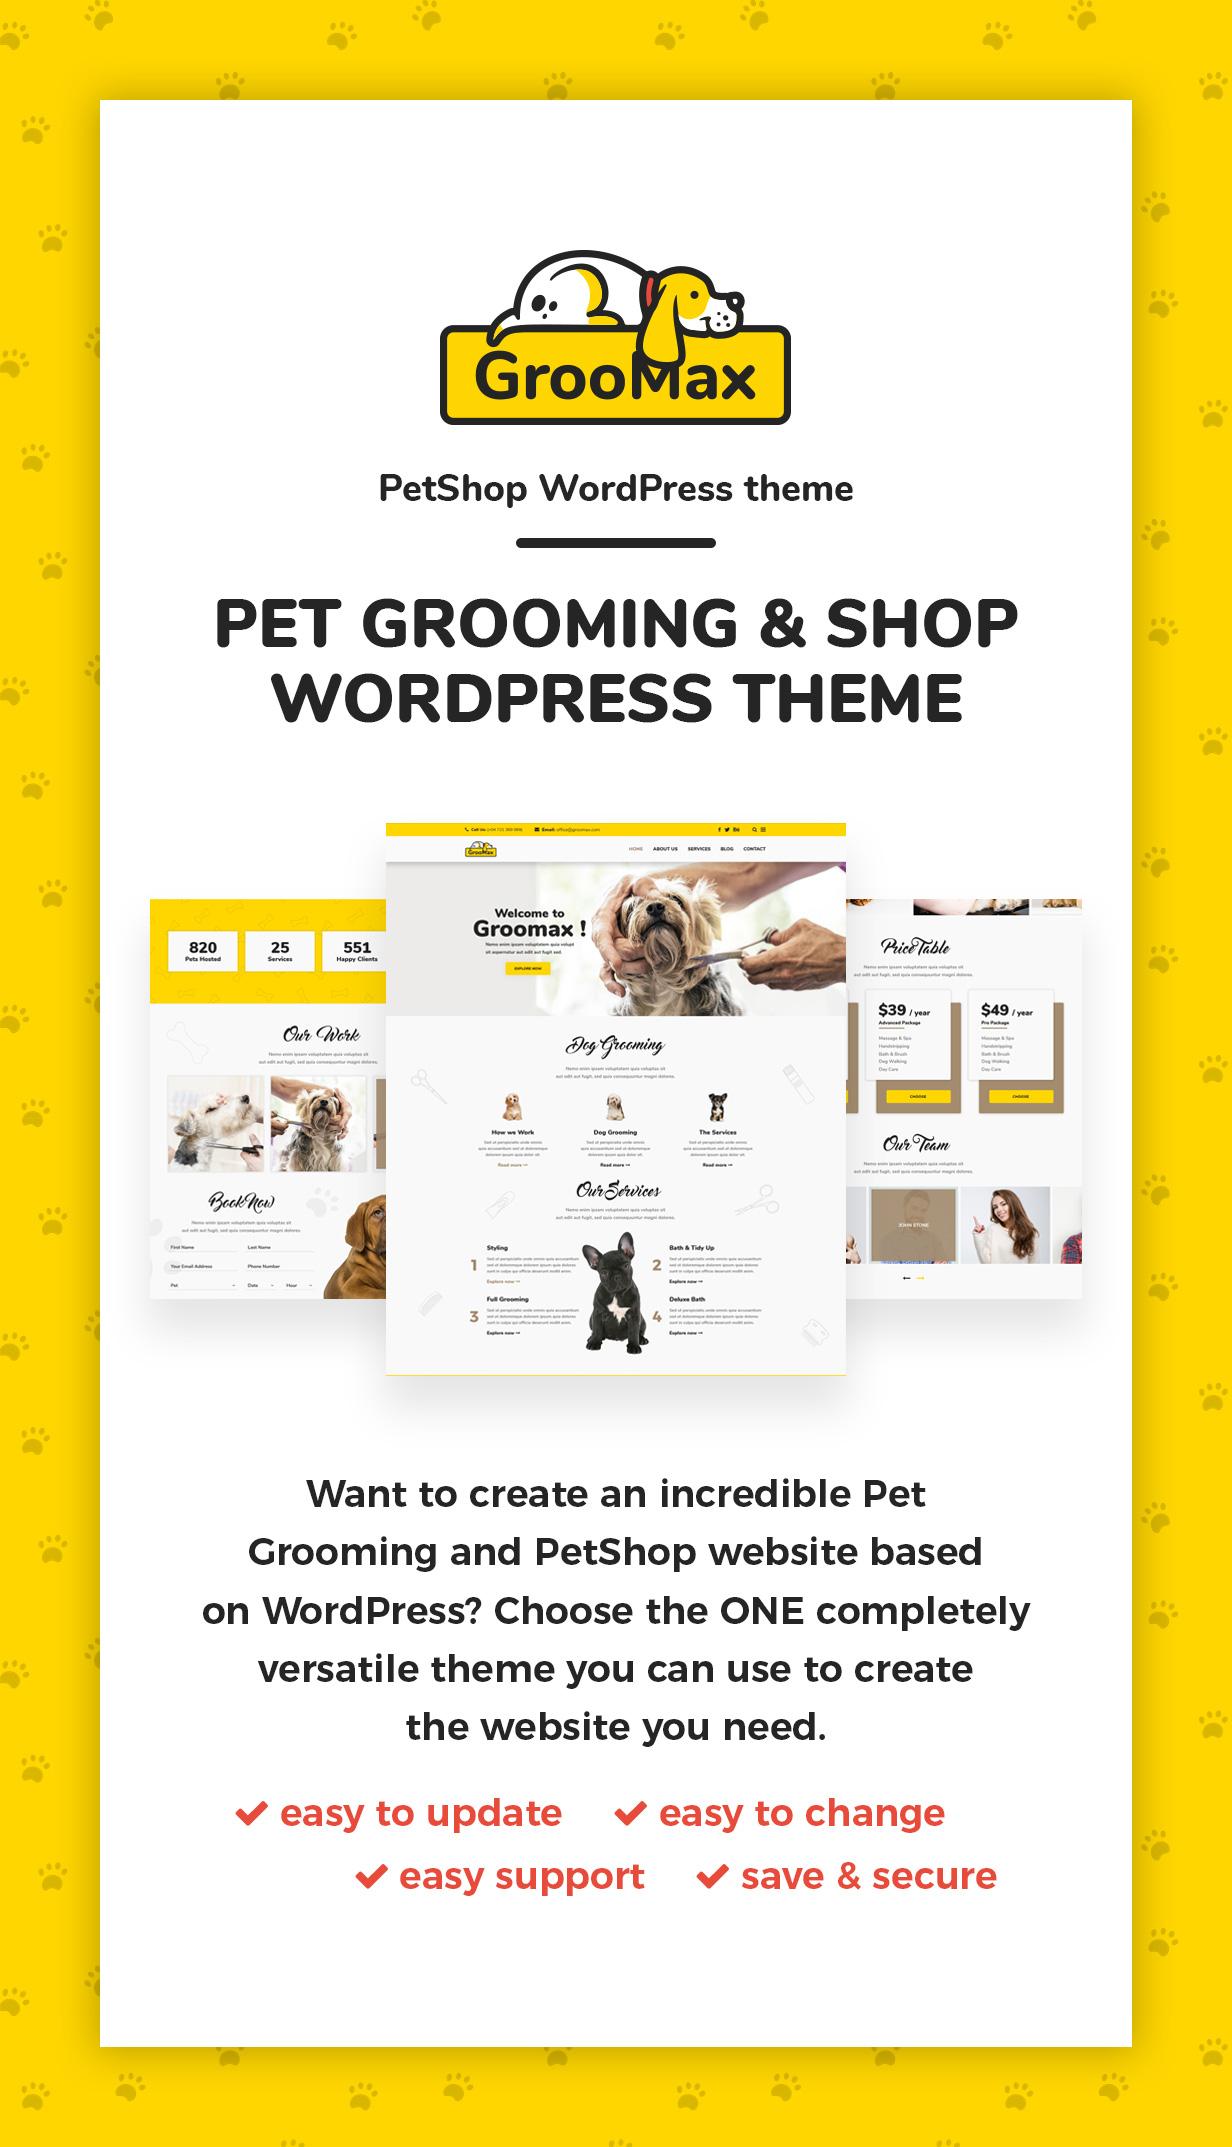 Groomax - Pet Grooming & Shop WordPress Theme - 2